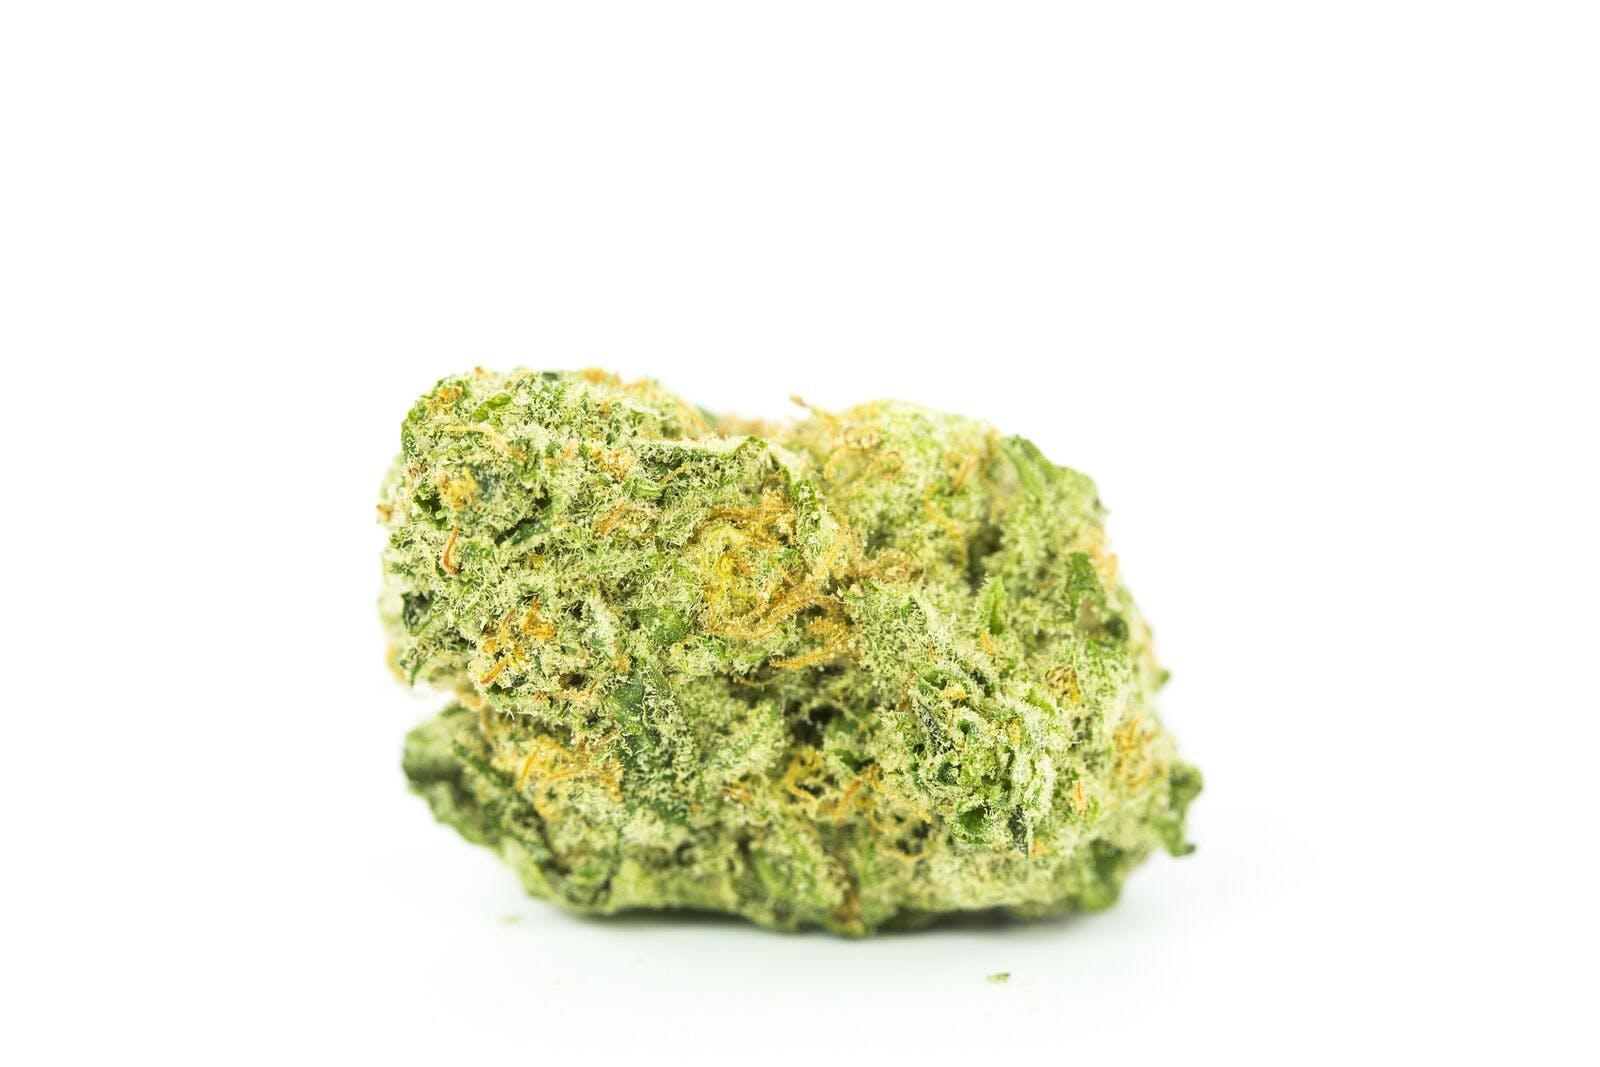 King Kong Weed; King Kong Cannabis Strain; King Kong Hybrid Marijuana Strain